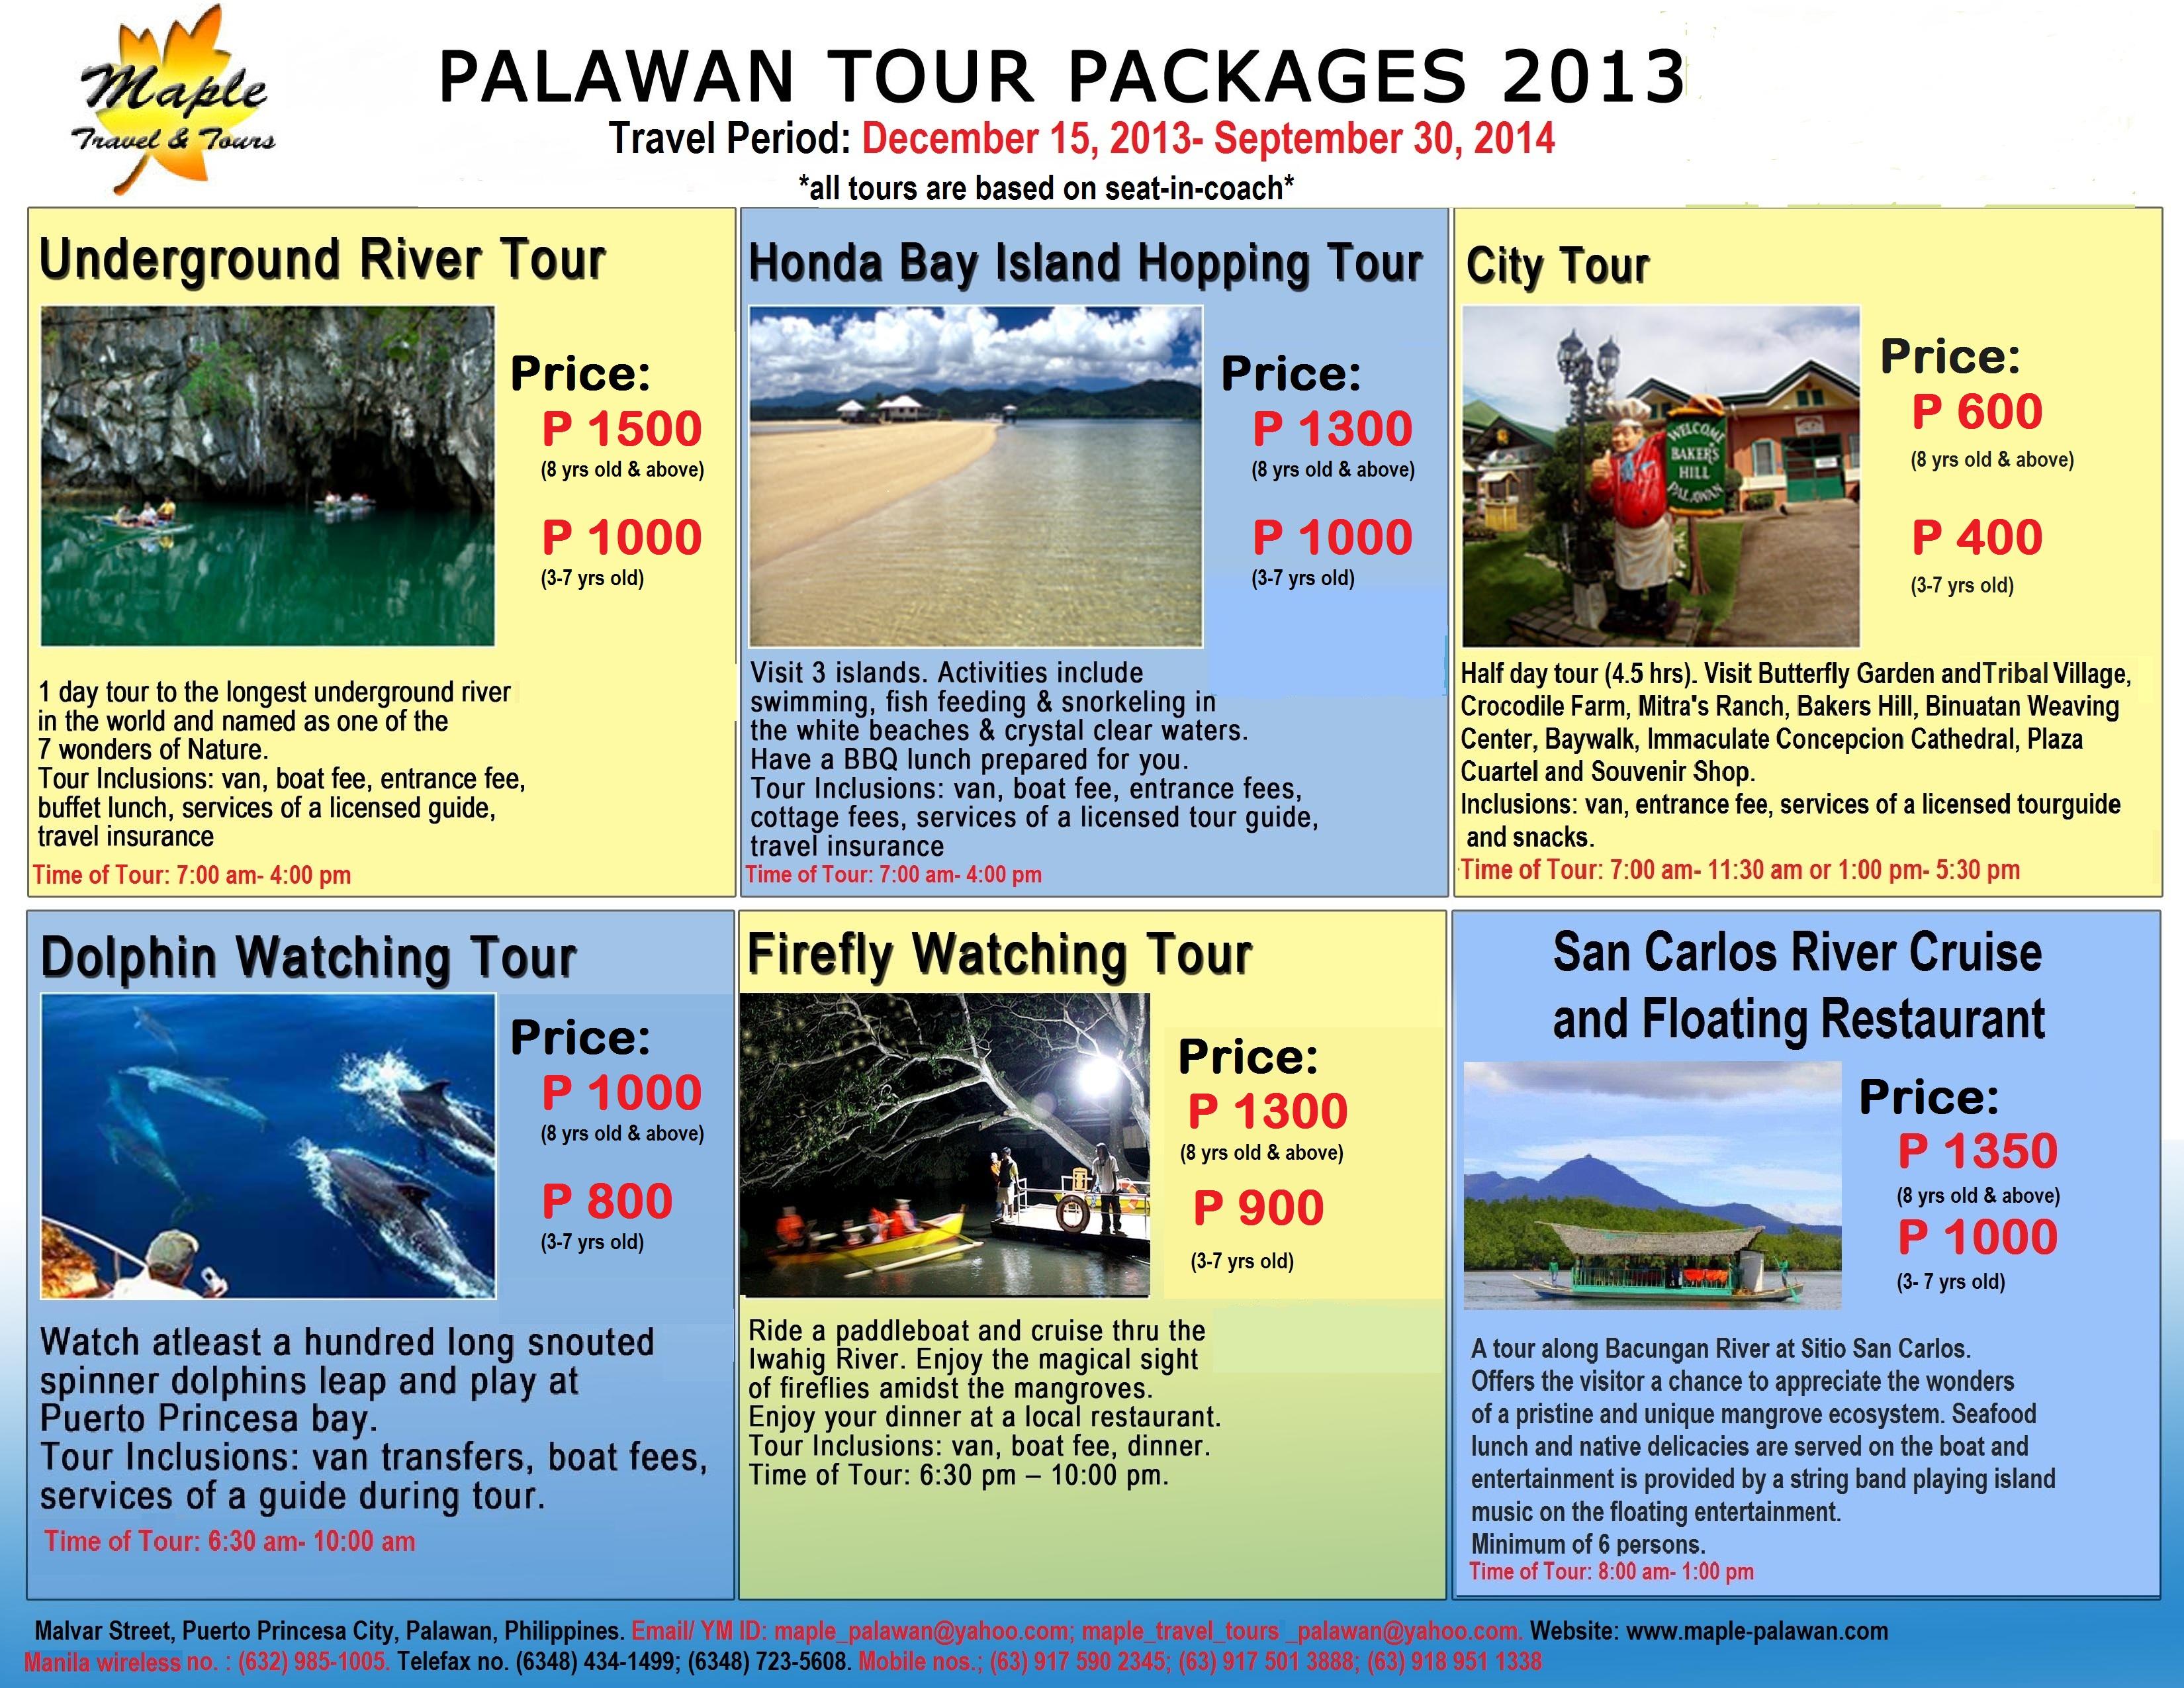 Tour Promos Maple Palawan